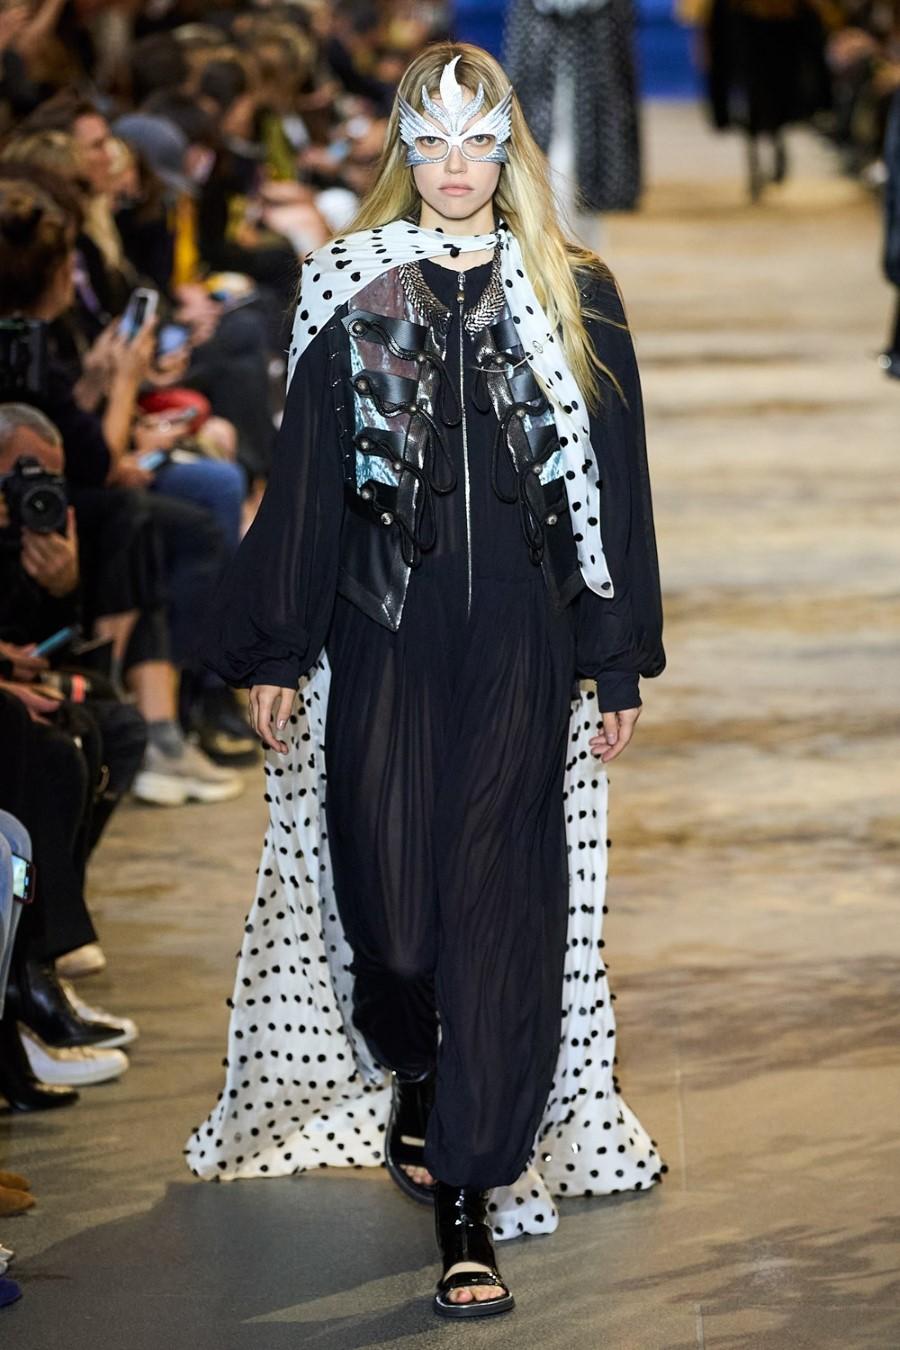 Louis Vuitton Spring Summer 2022 - Paris Fashion Week